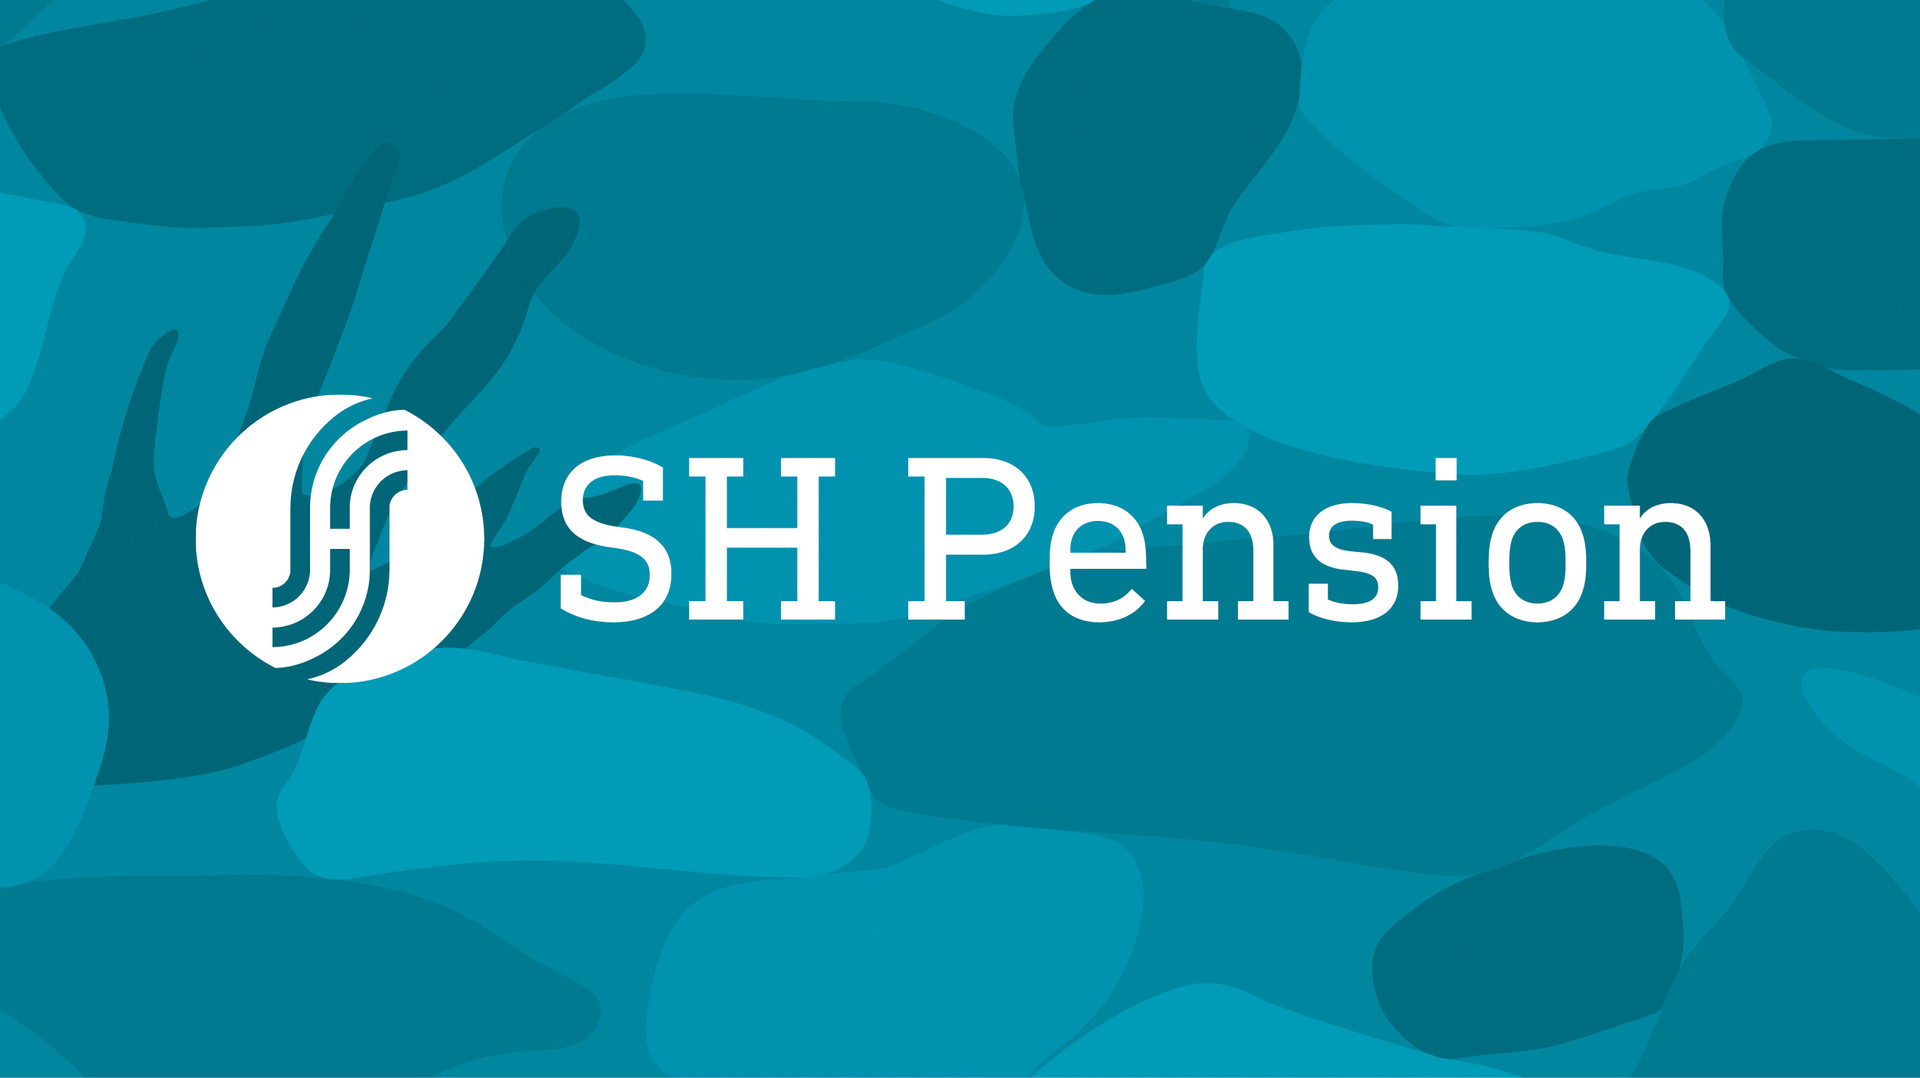 Svenska Designpriset_SH Pension_logo.jpg